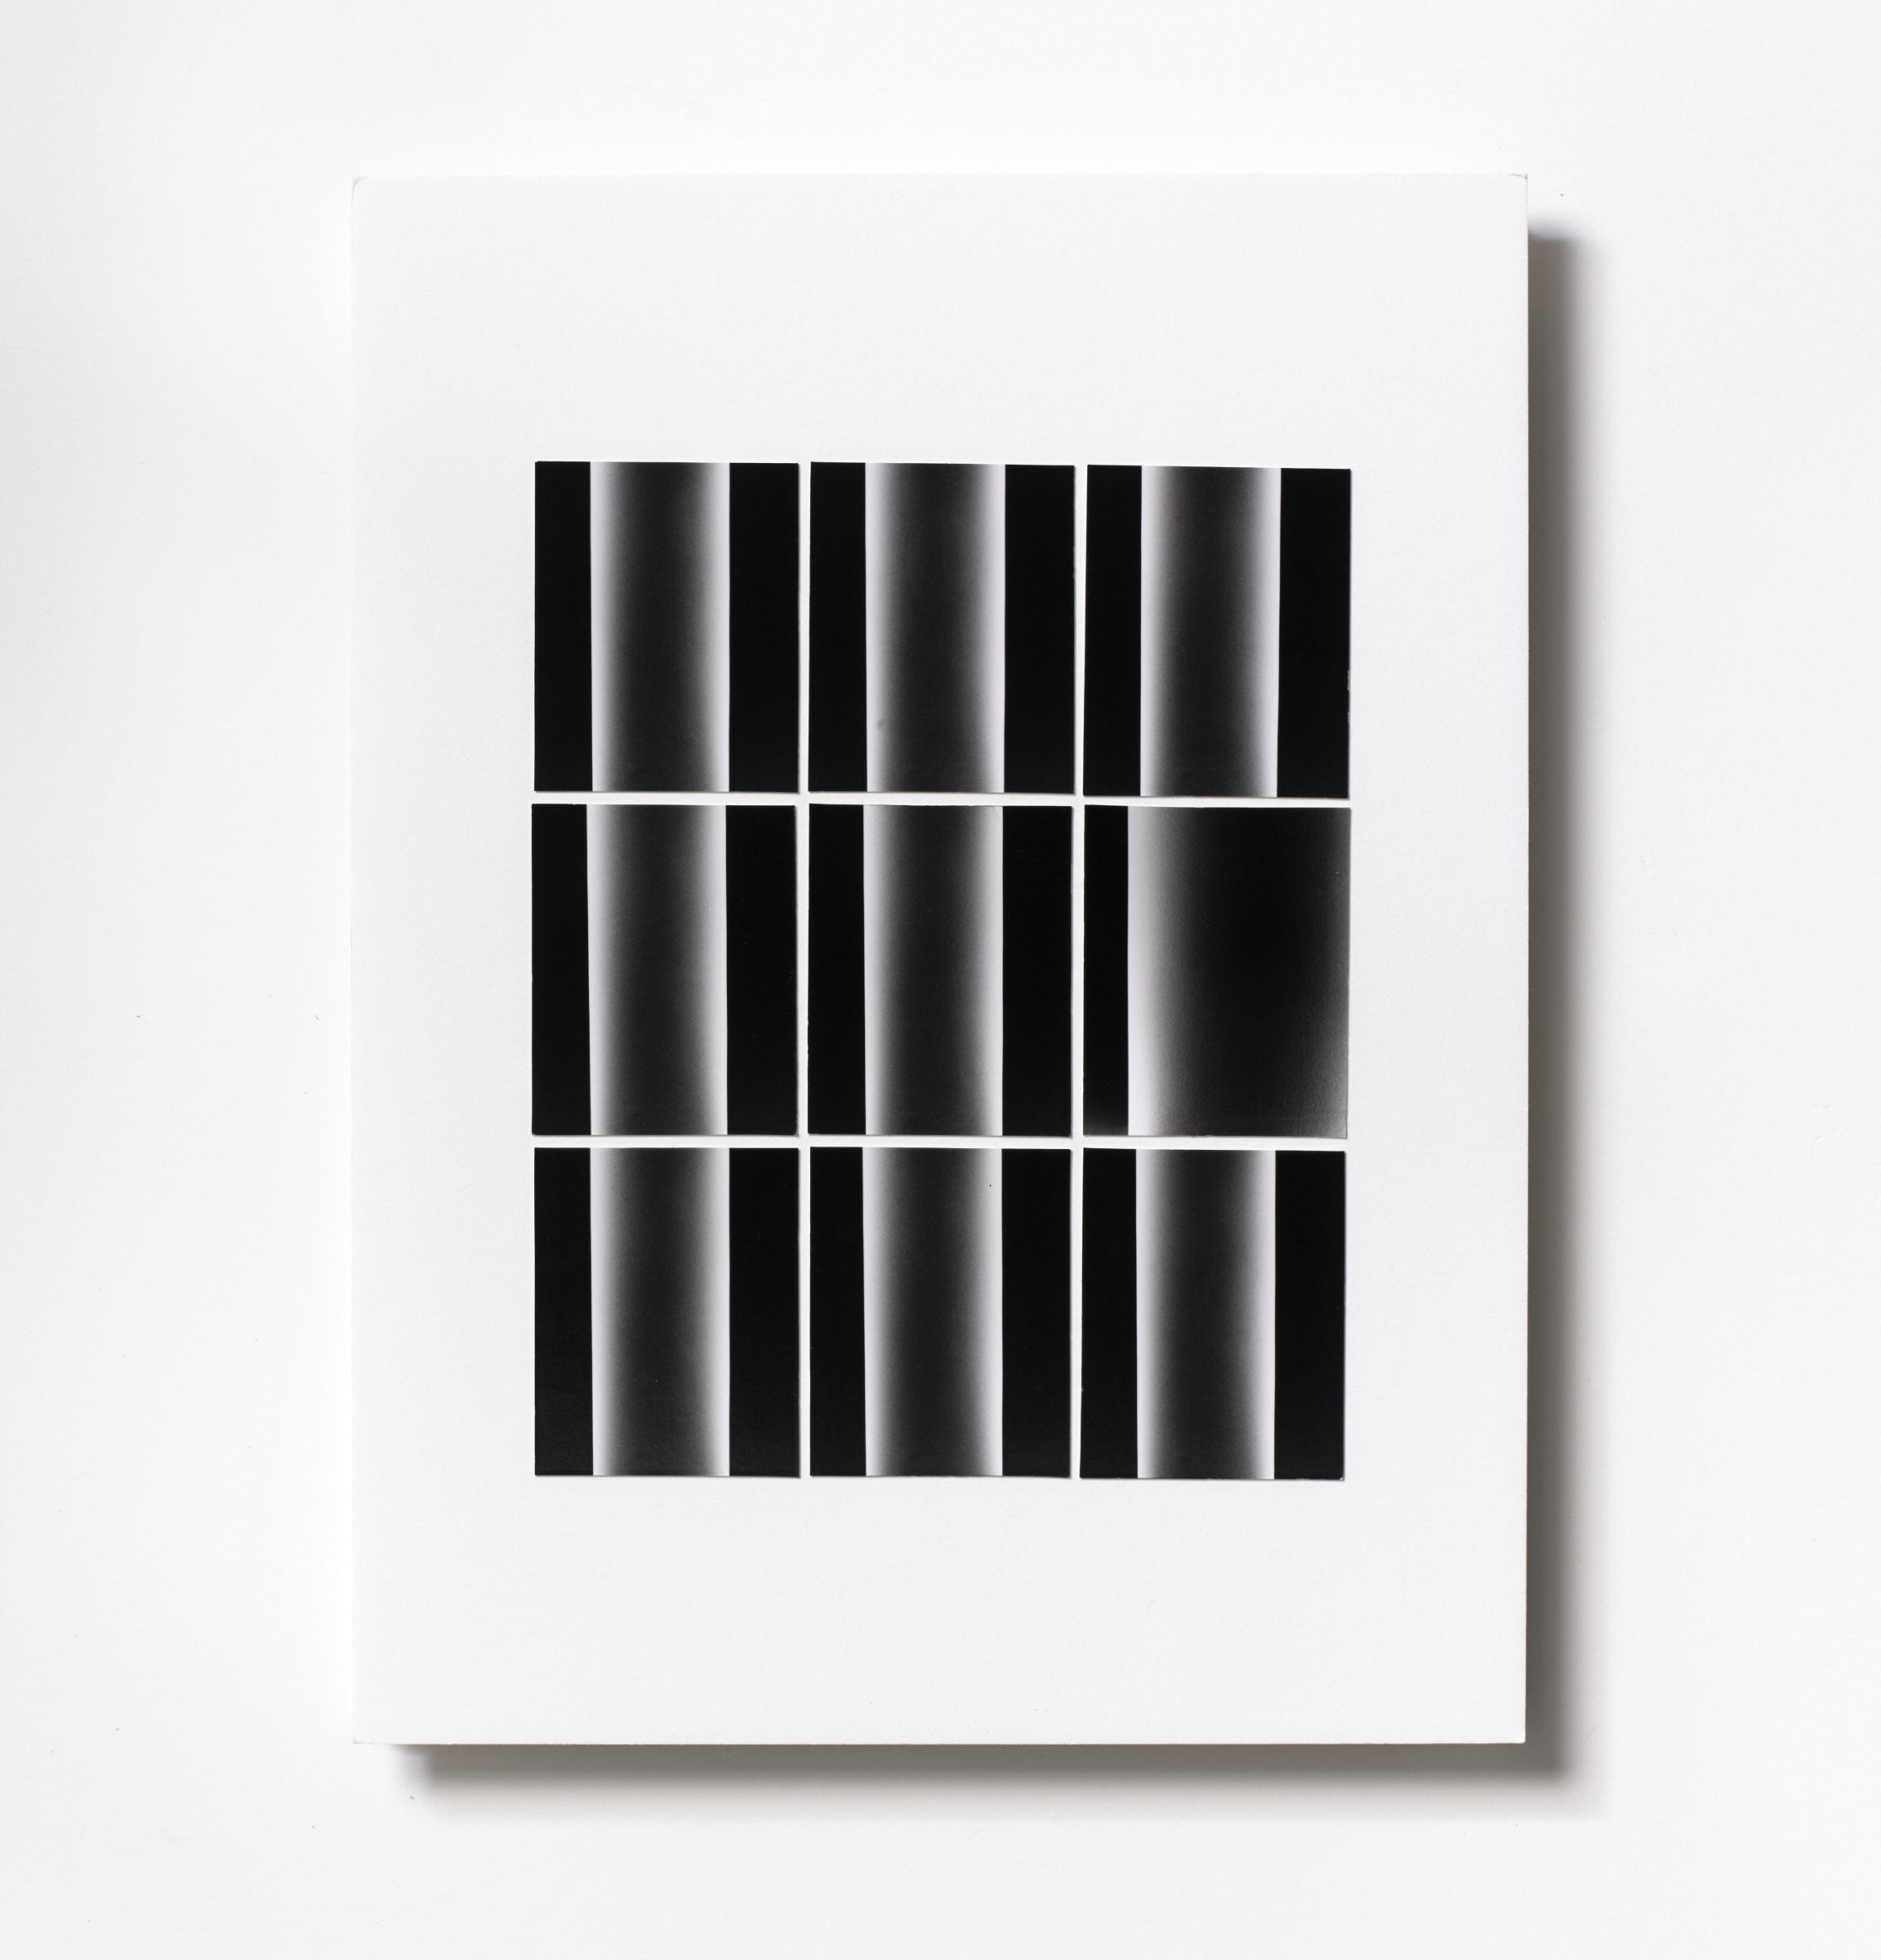 "<span class=""link fancybox-details-link""><a href=""/content/feature/114/artworks554/"">View Detail Page</a></span><div class=""medium"">Silver Gelatin Print Collage<br /> Unique</div> <div class=""dimensions"">30.5 x 22.9 cm<br /> 12 x 9 in</div>"